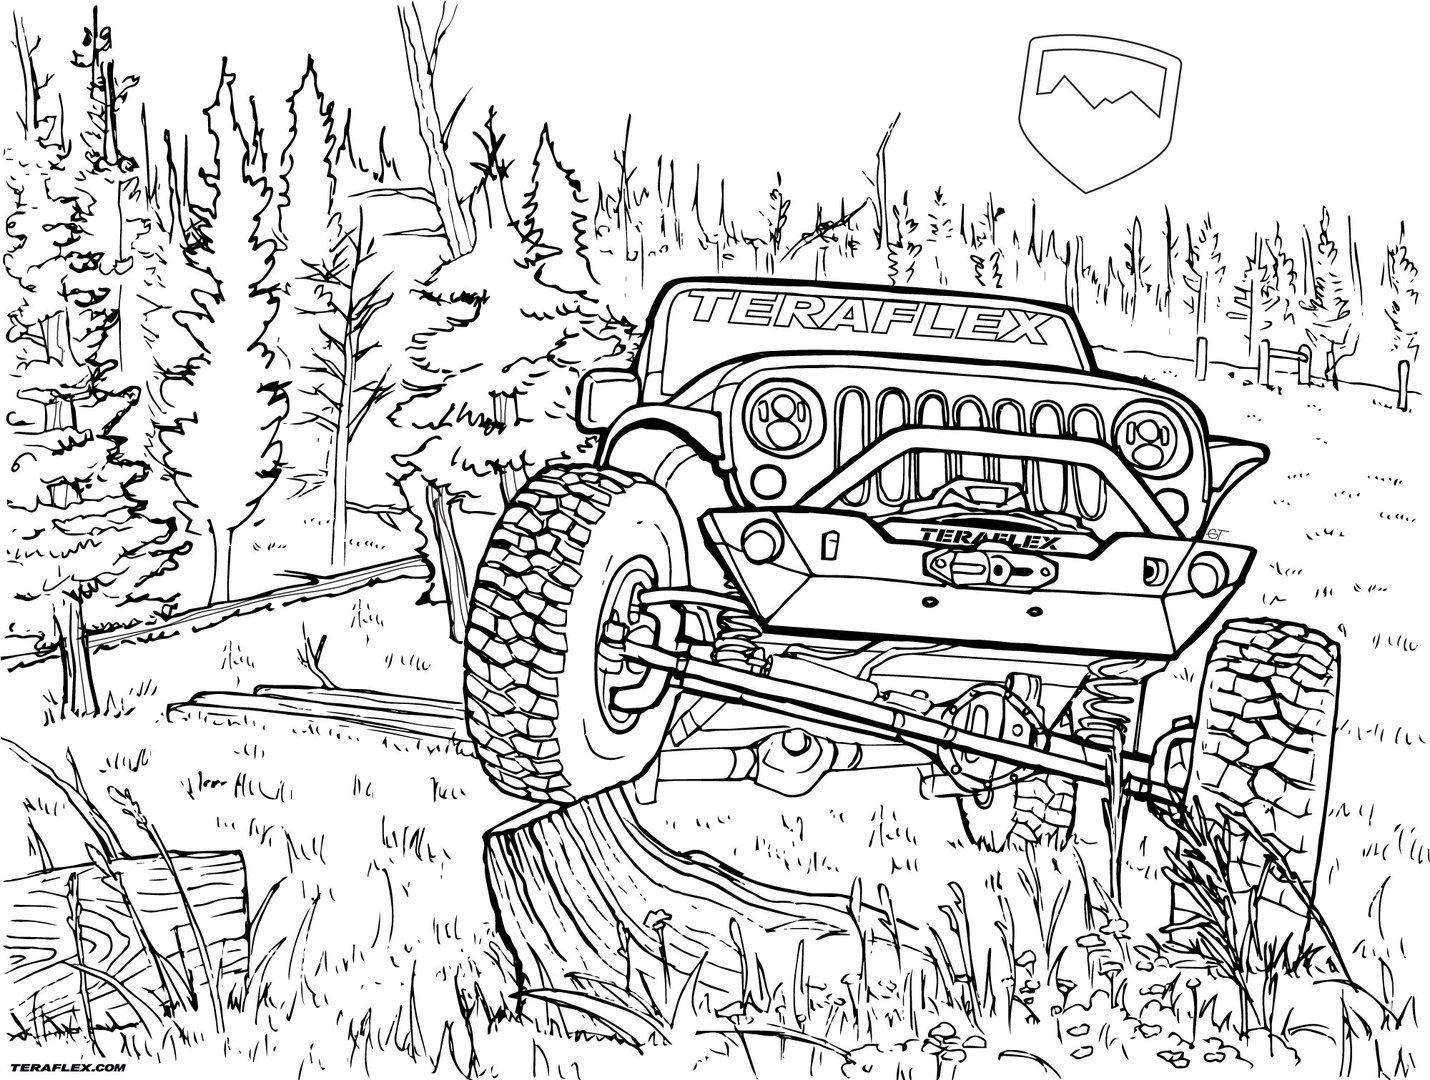 Gallery Teraflex Jeep Coloring Pages Teraflex In 2021 Jeep Art Truck Coloring Pages Coloring Pages